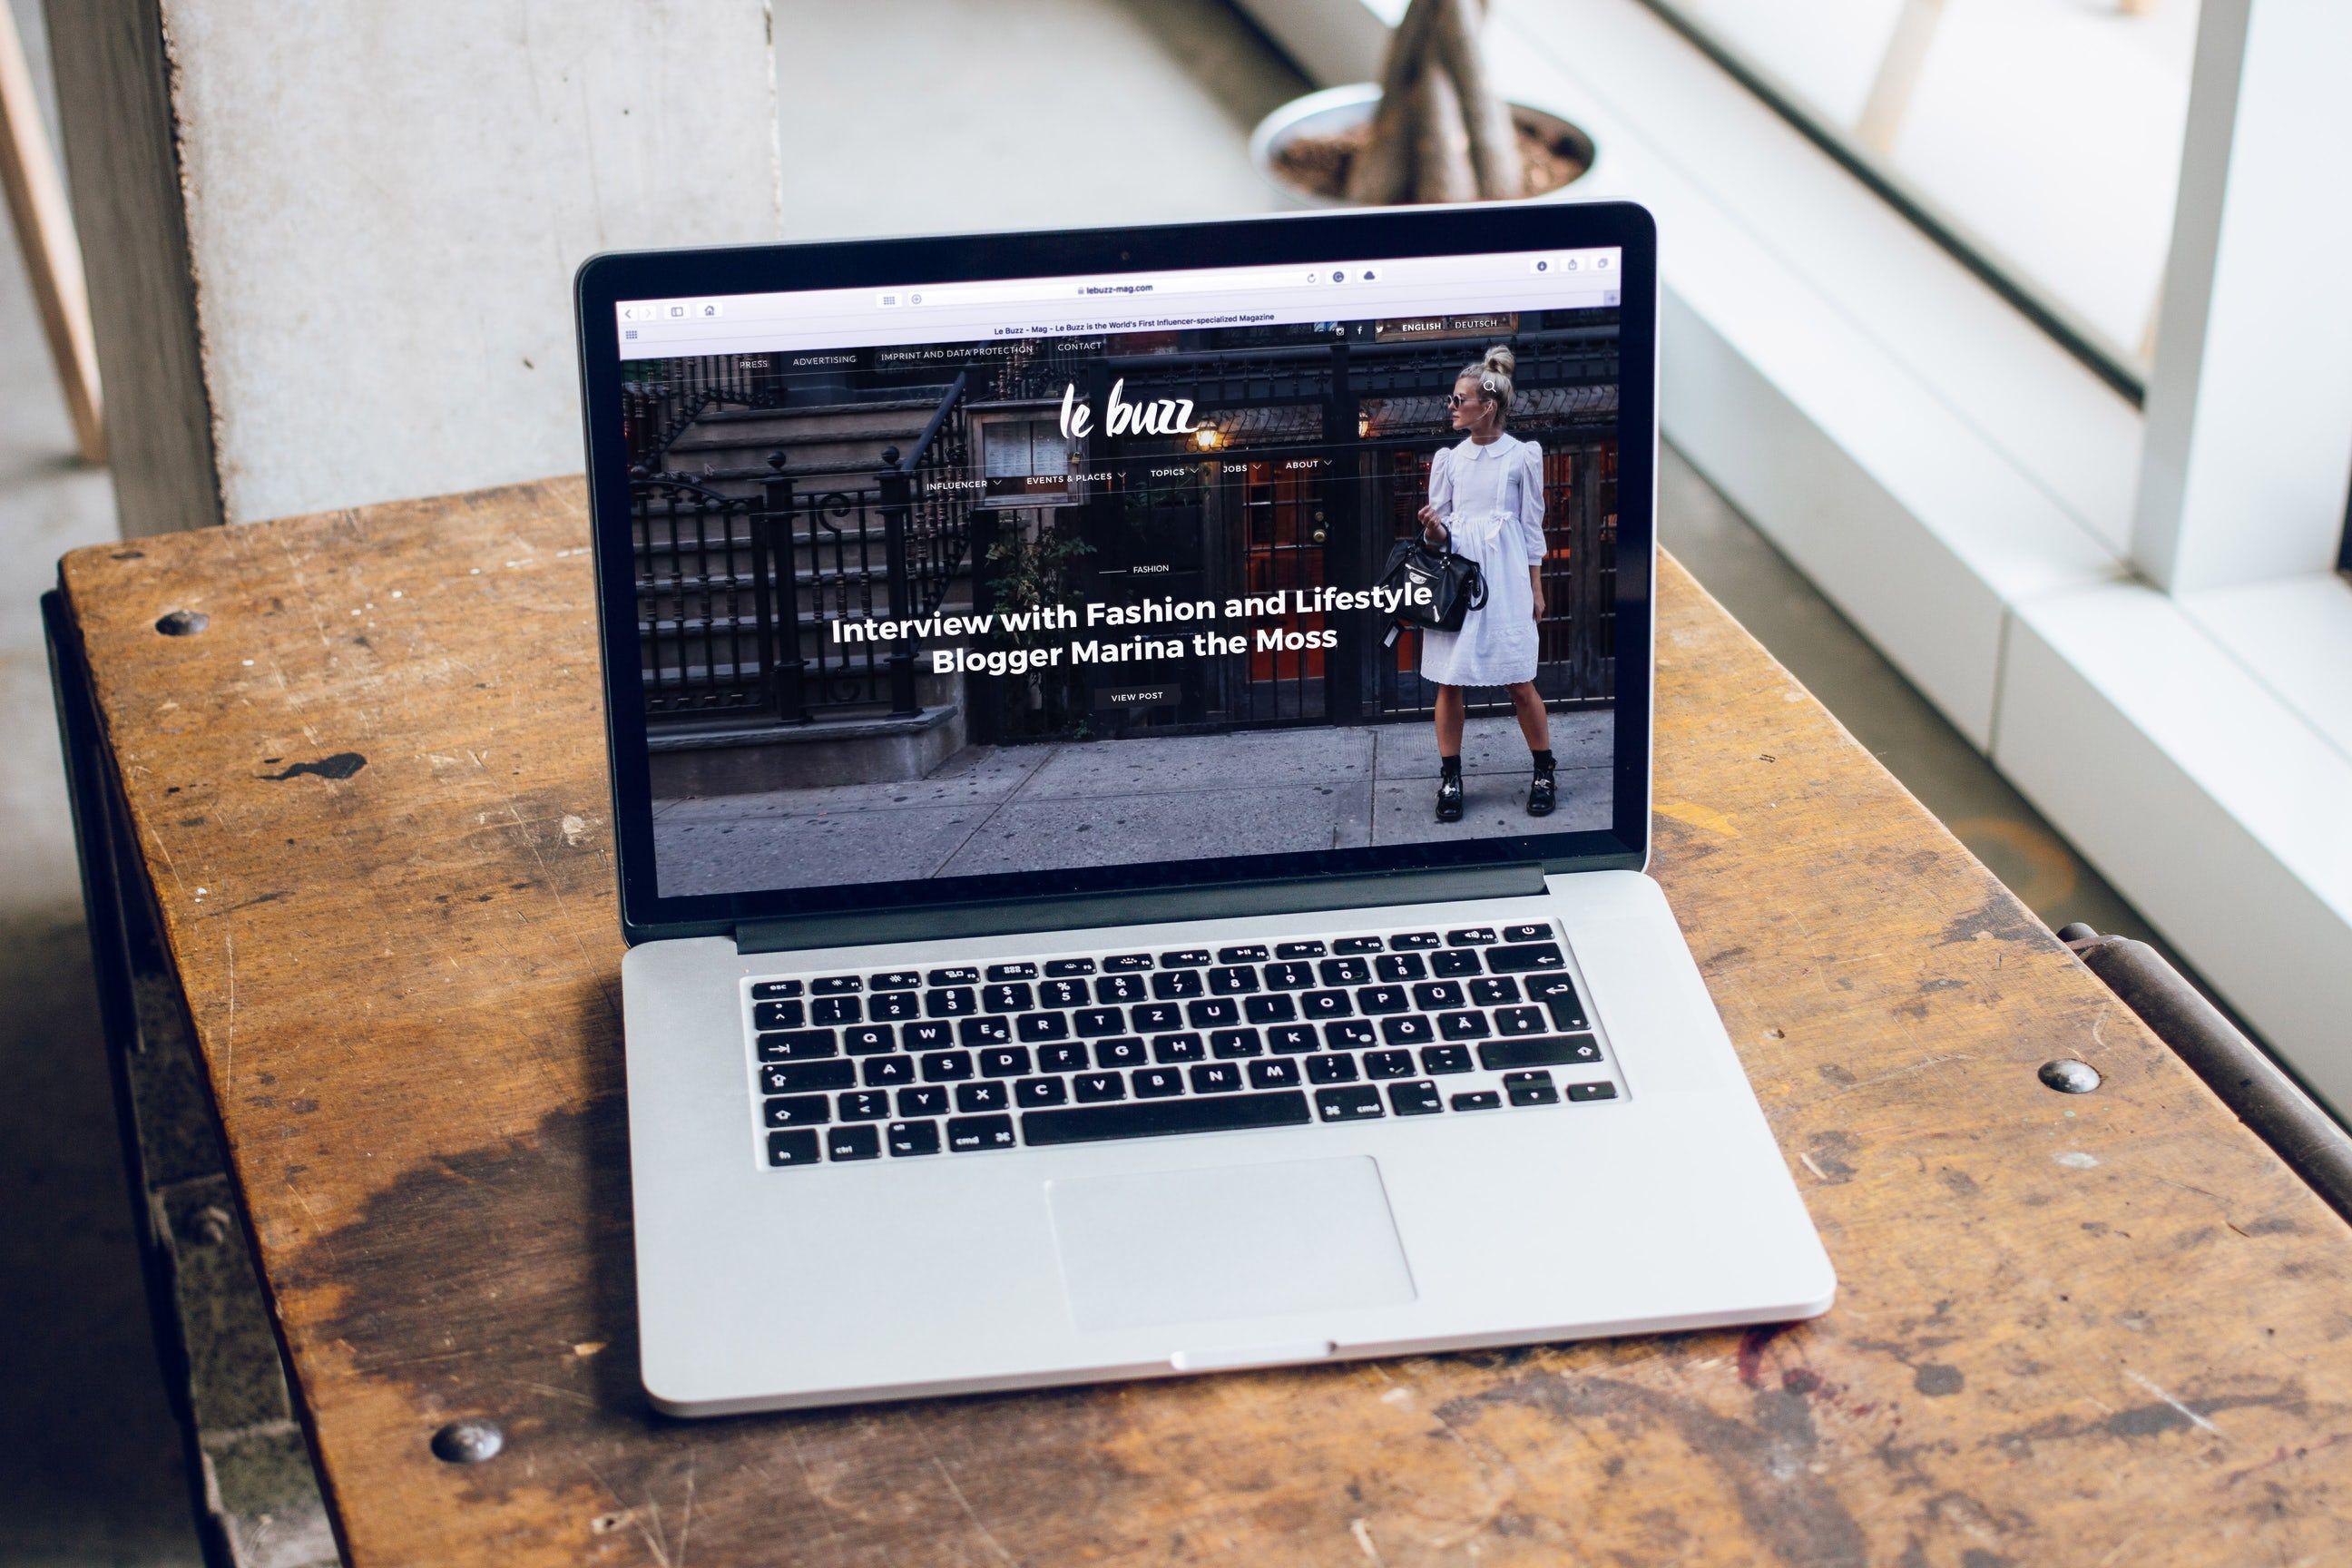 Macbook Pro On Brown Wooden Table Best Web Design Company Orlando Web Design Art Photography Marketing Web Design Company Best Web Design